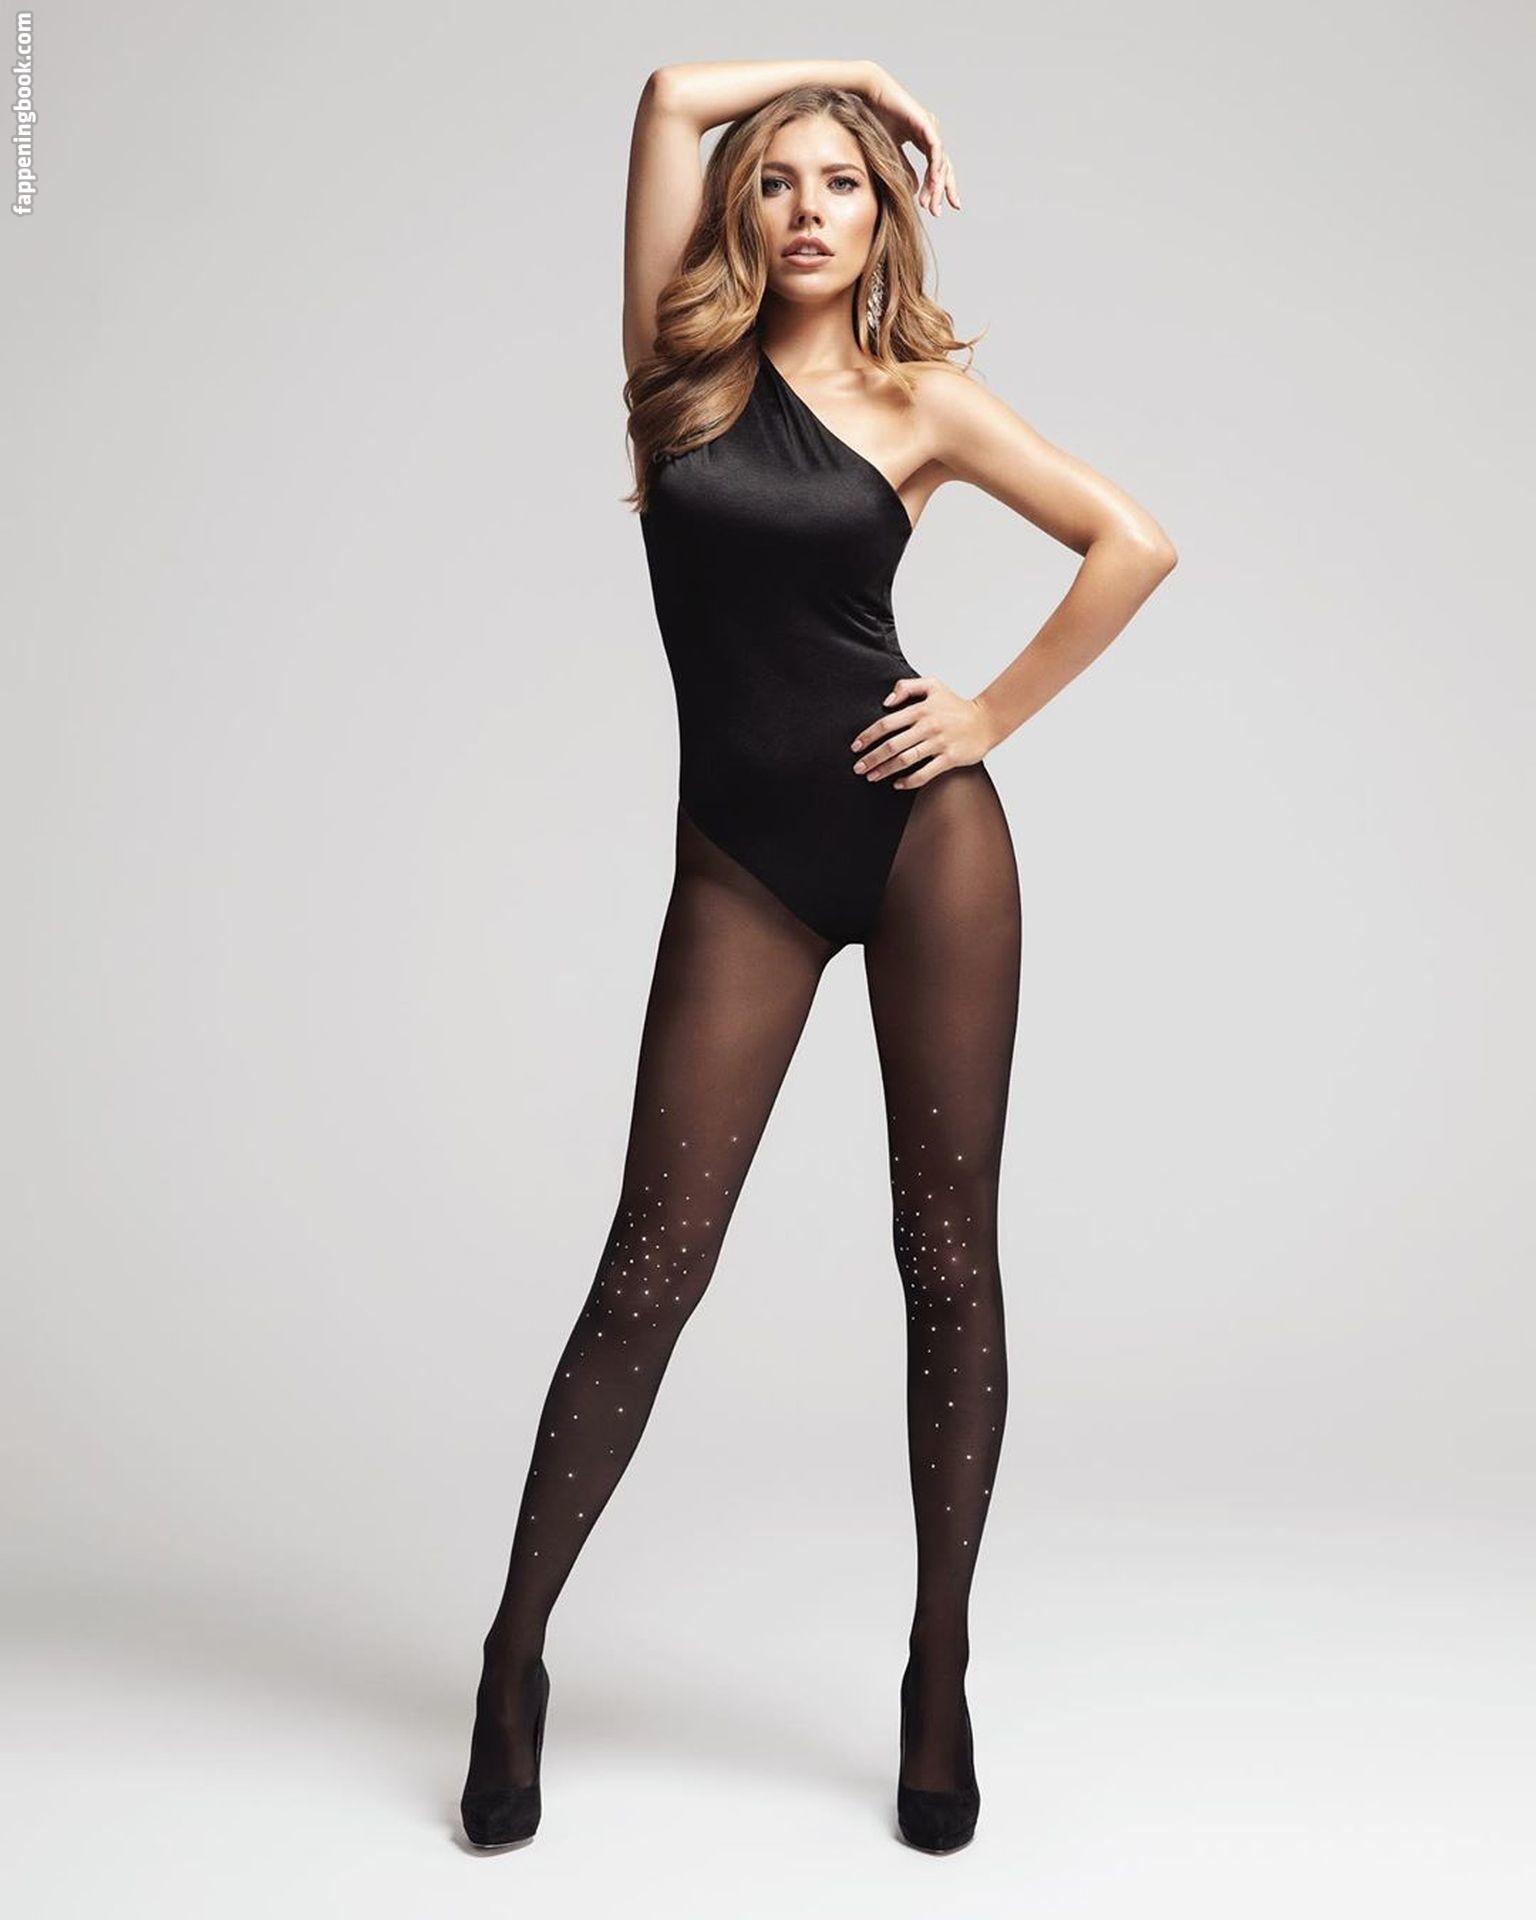 Victoria Swarovski Nude And Sexy Explicit Collection (117